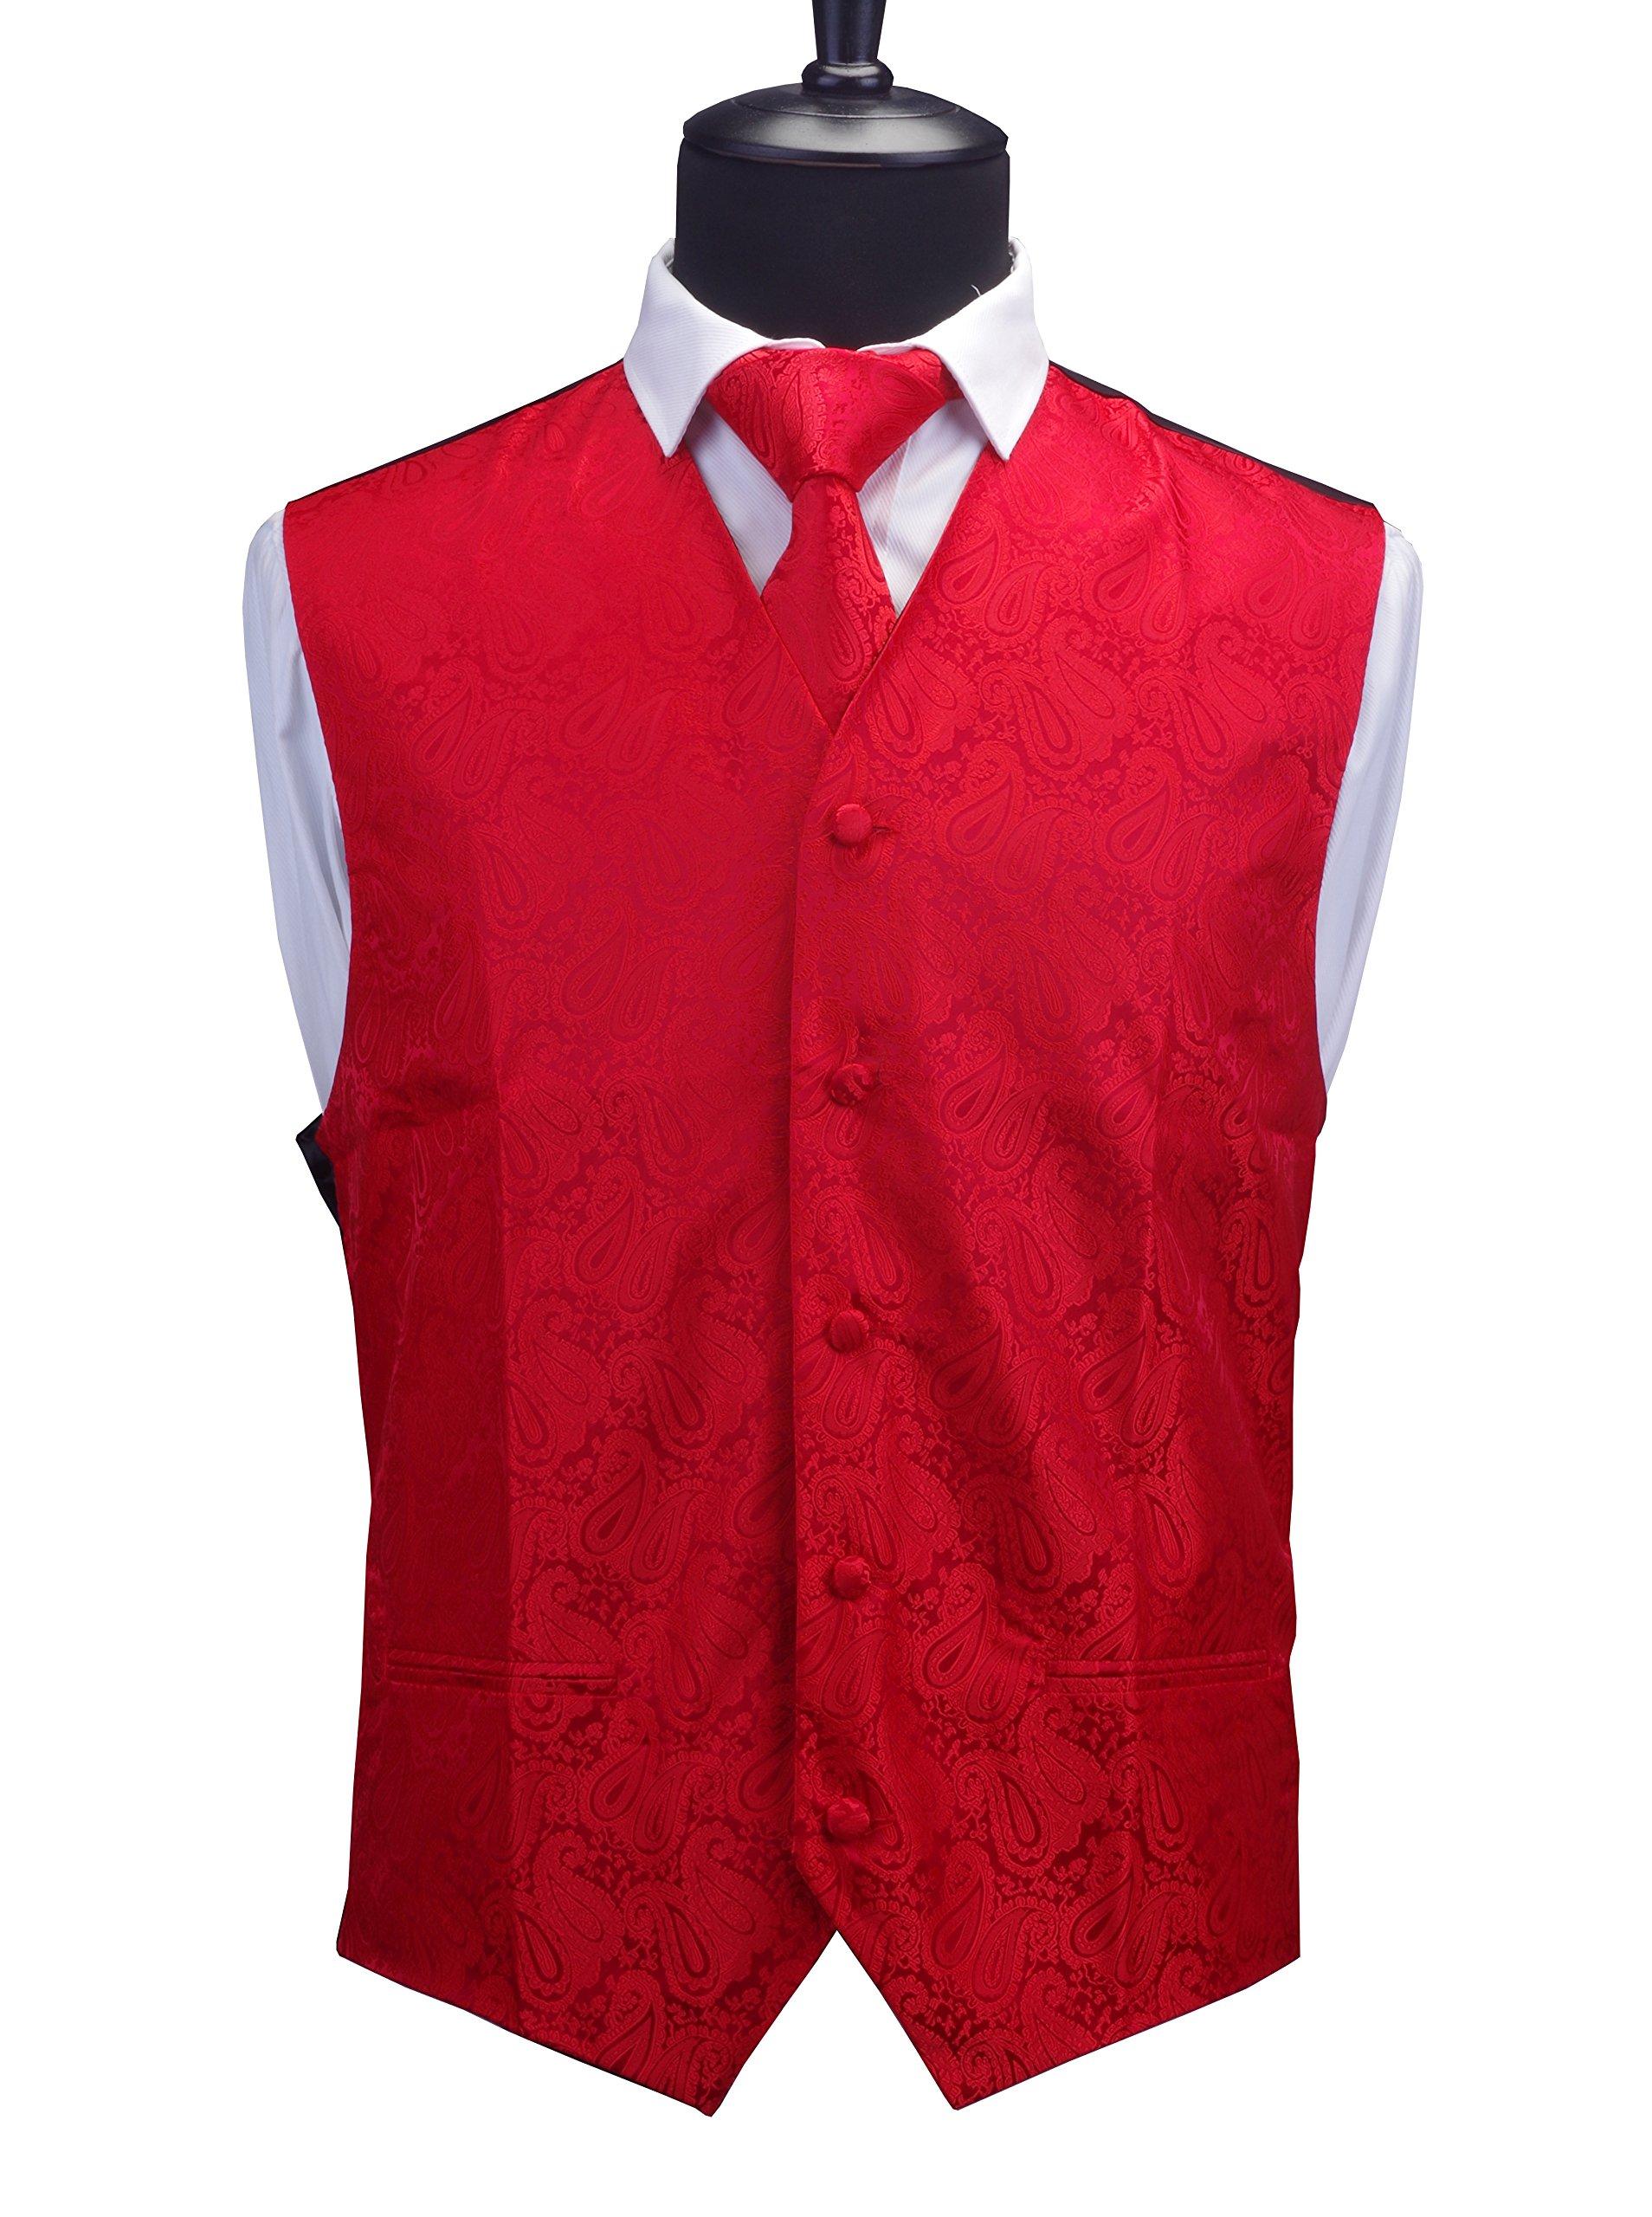 bda2e57400836 GUSLESON 3pc Mens Paisley Vest Necktie Pocket Square Set for Suit or Tuxedo  (Red, S)